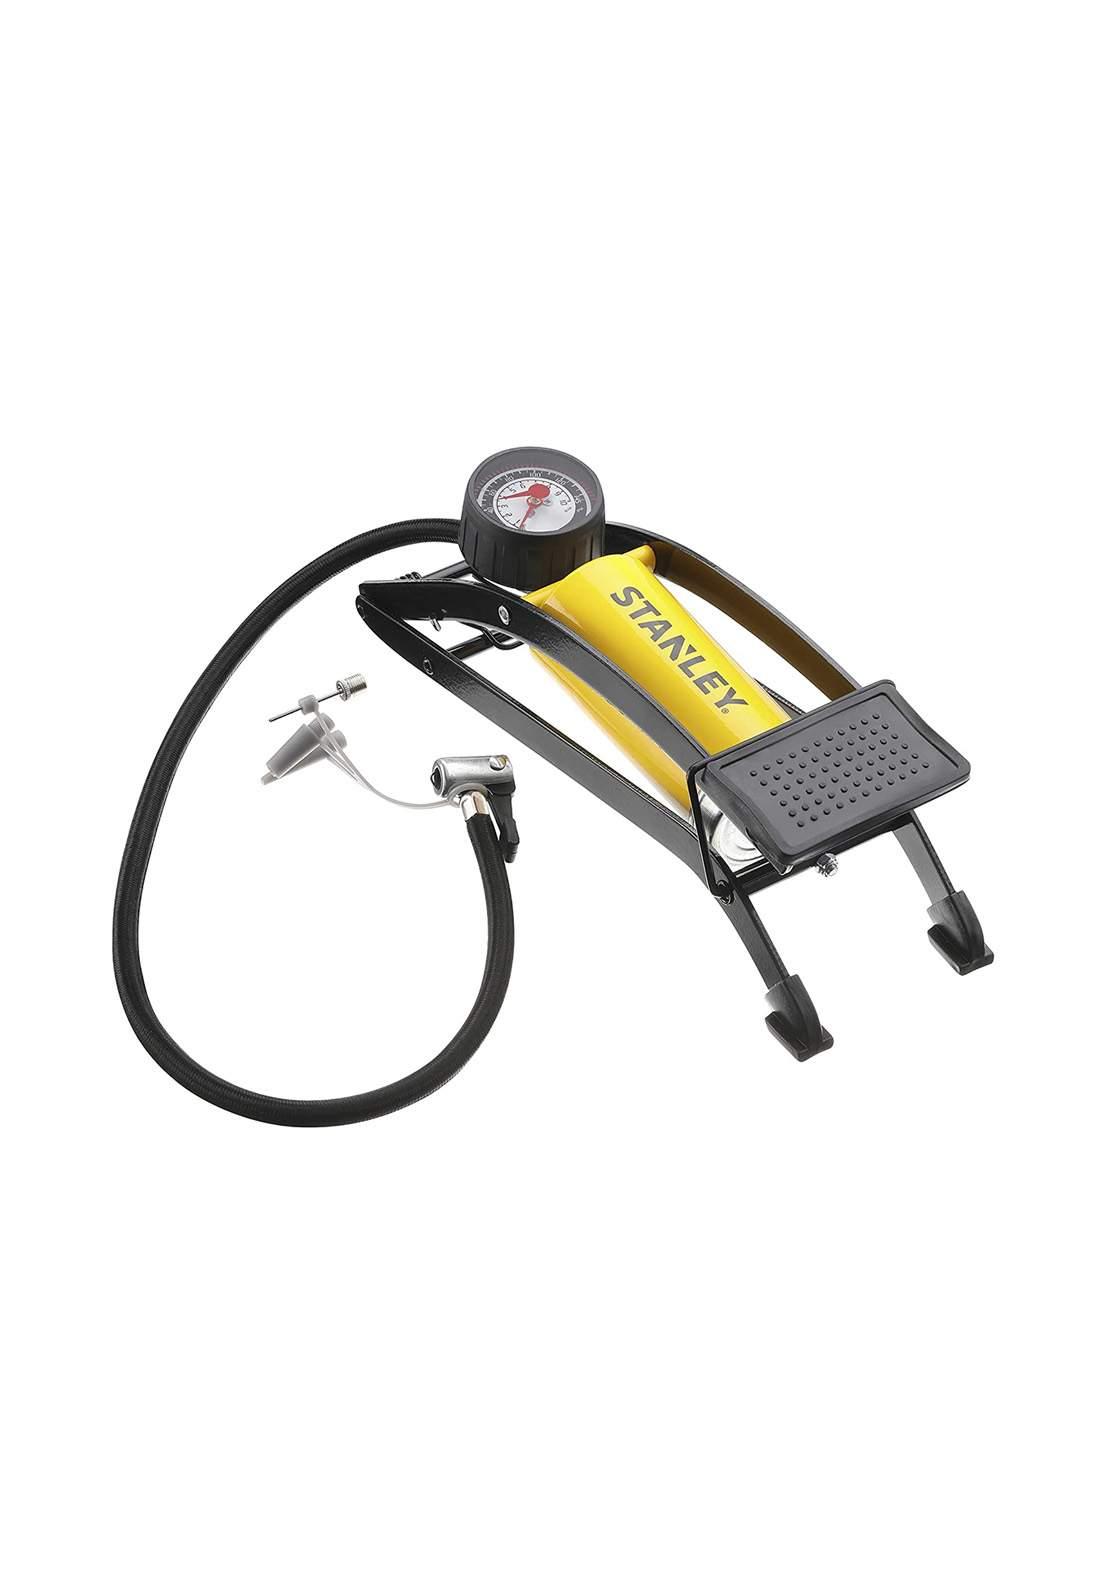 Stanley STHT80894-1 High Pressure Cylindrical Pedal Pump منفاخ اطارات السيارة